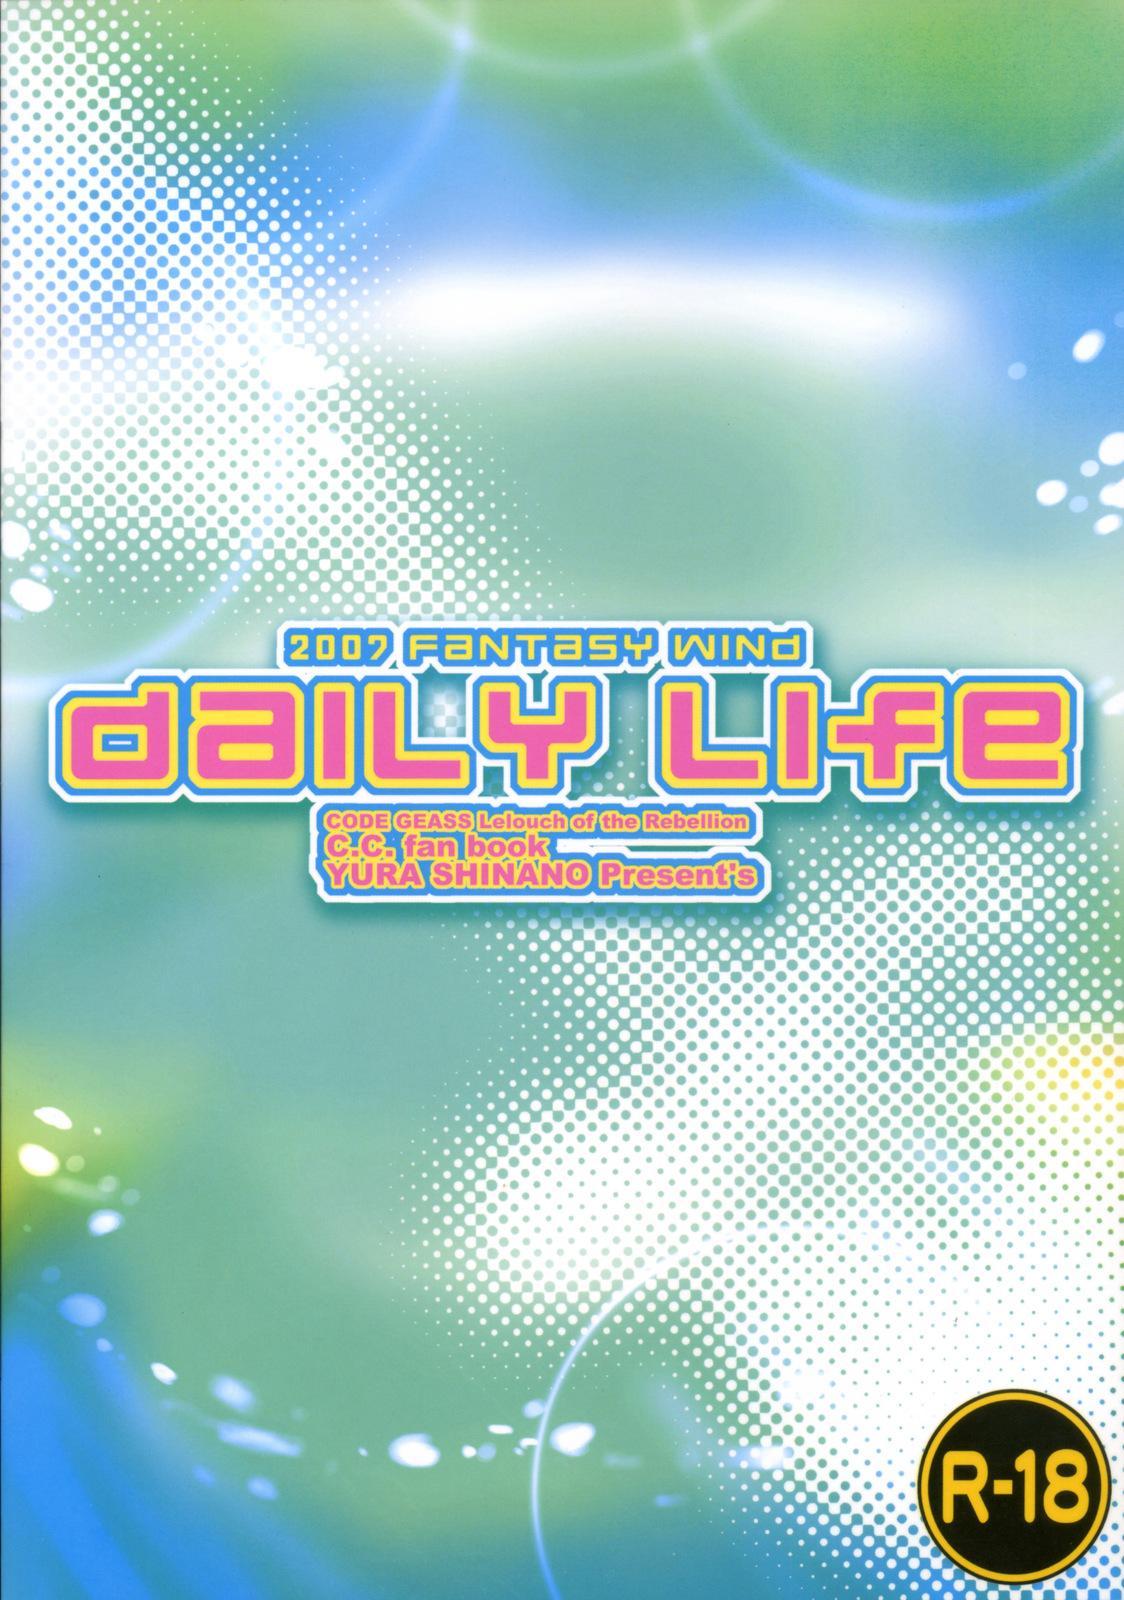 (C72) [FANTASY WIND (Shinano Yura)} Daily Life (Code Geass: Lelouch of the Rebellion) 13